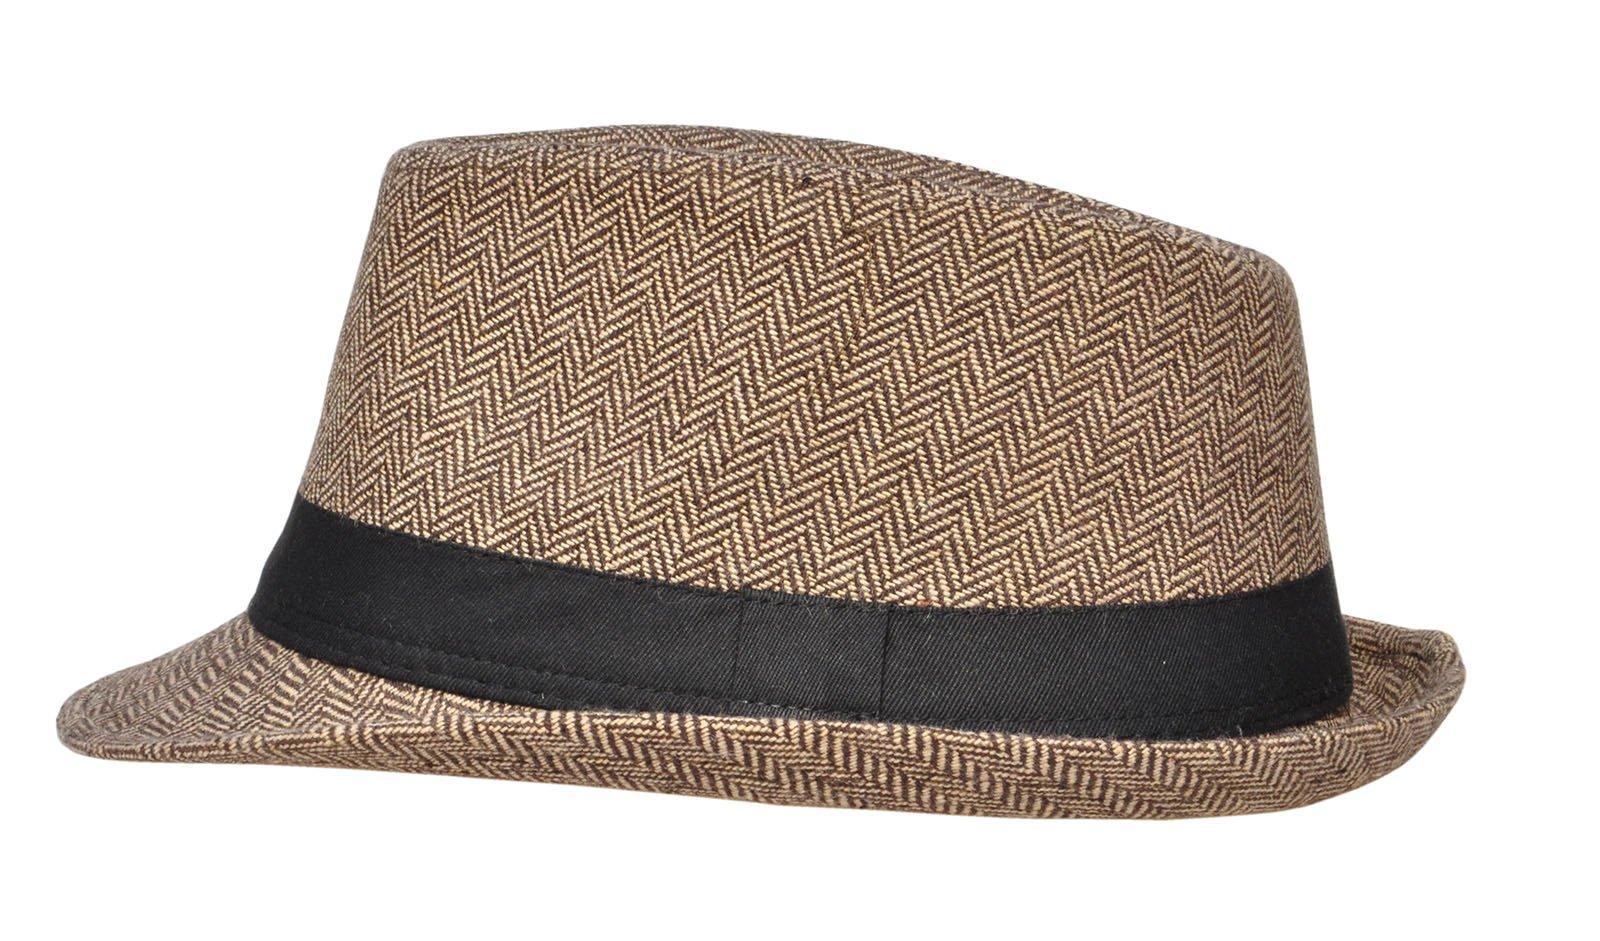 8d08dc310b5fe Simplicity Men Women Manhattan Structured Gangster Trilby Wool Fedora Hat    Fedoras   Clothing